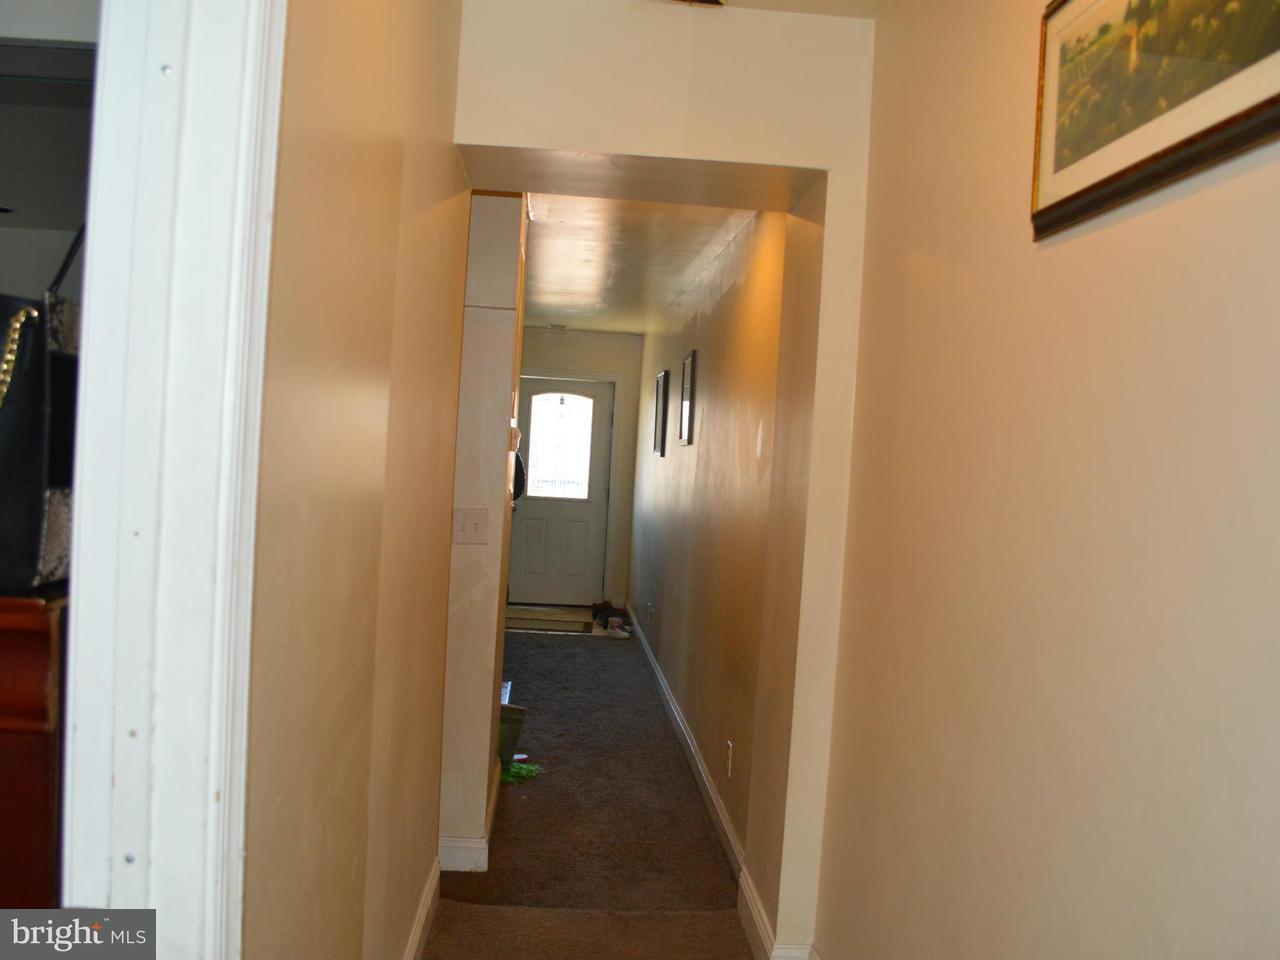 Additional photo for property listing at 1679 MONTELLO AVE NE 1679 MONTELLO AVE NE Washington, District De Columbia 20002 États-Unis